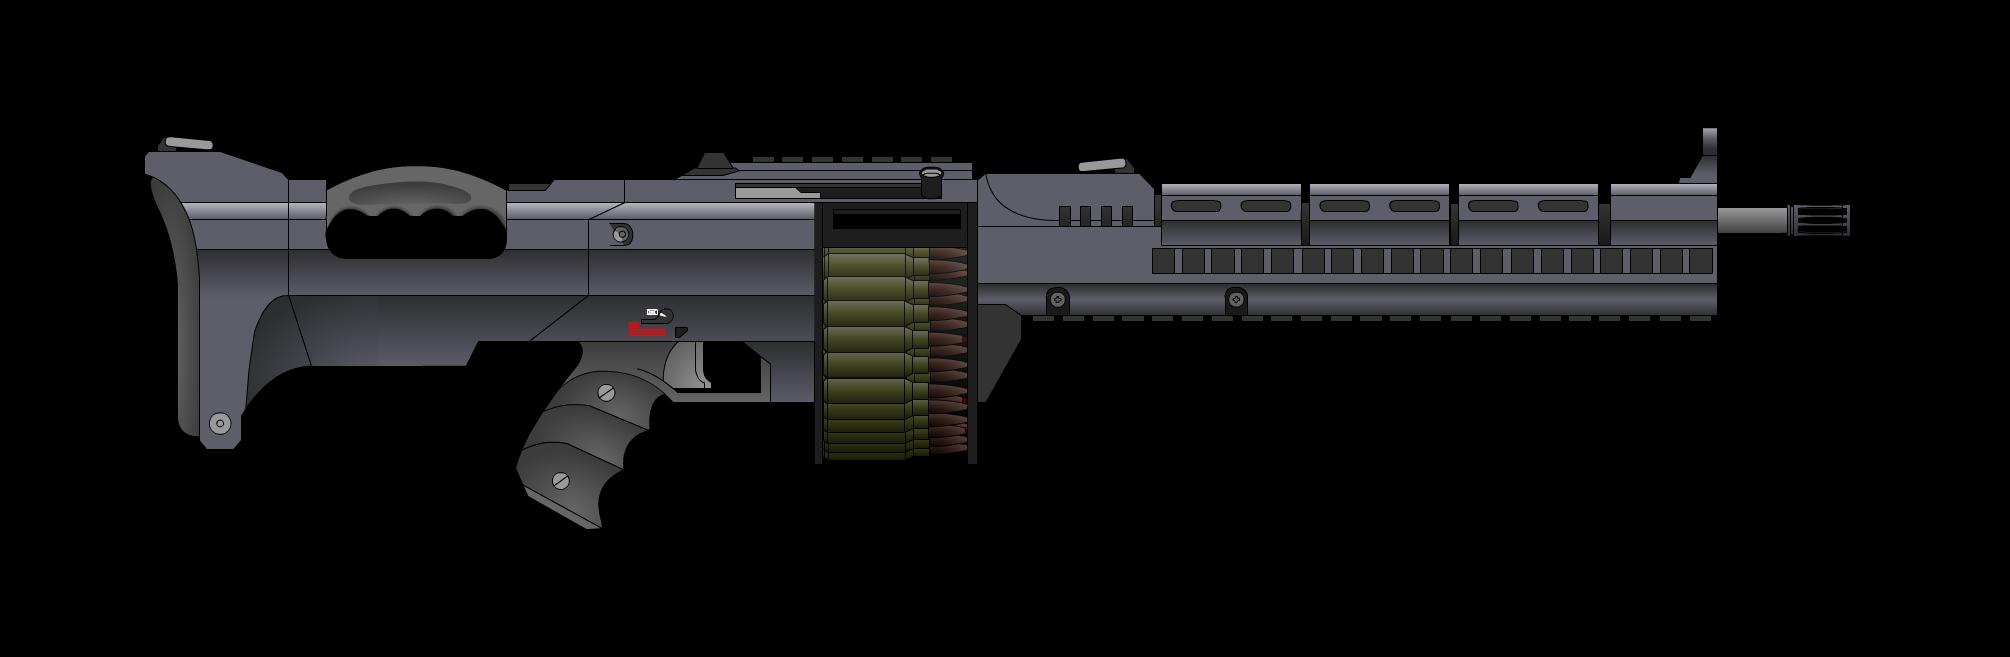 M122 Light Machine Gun